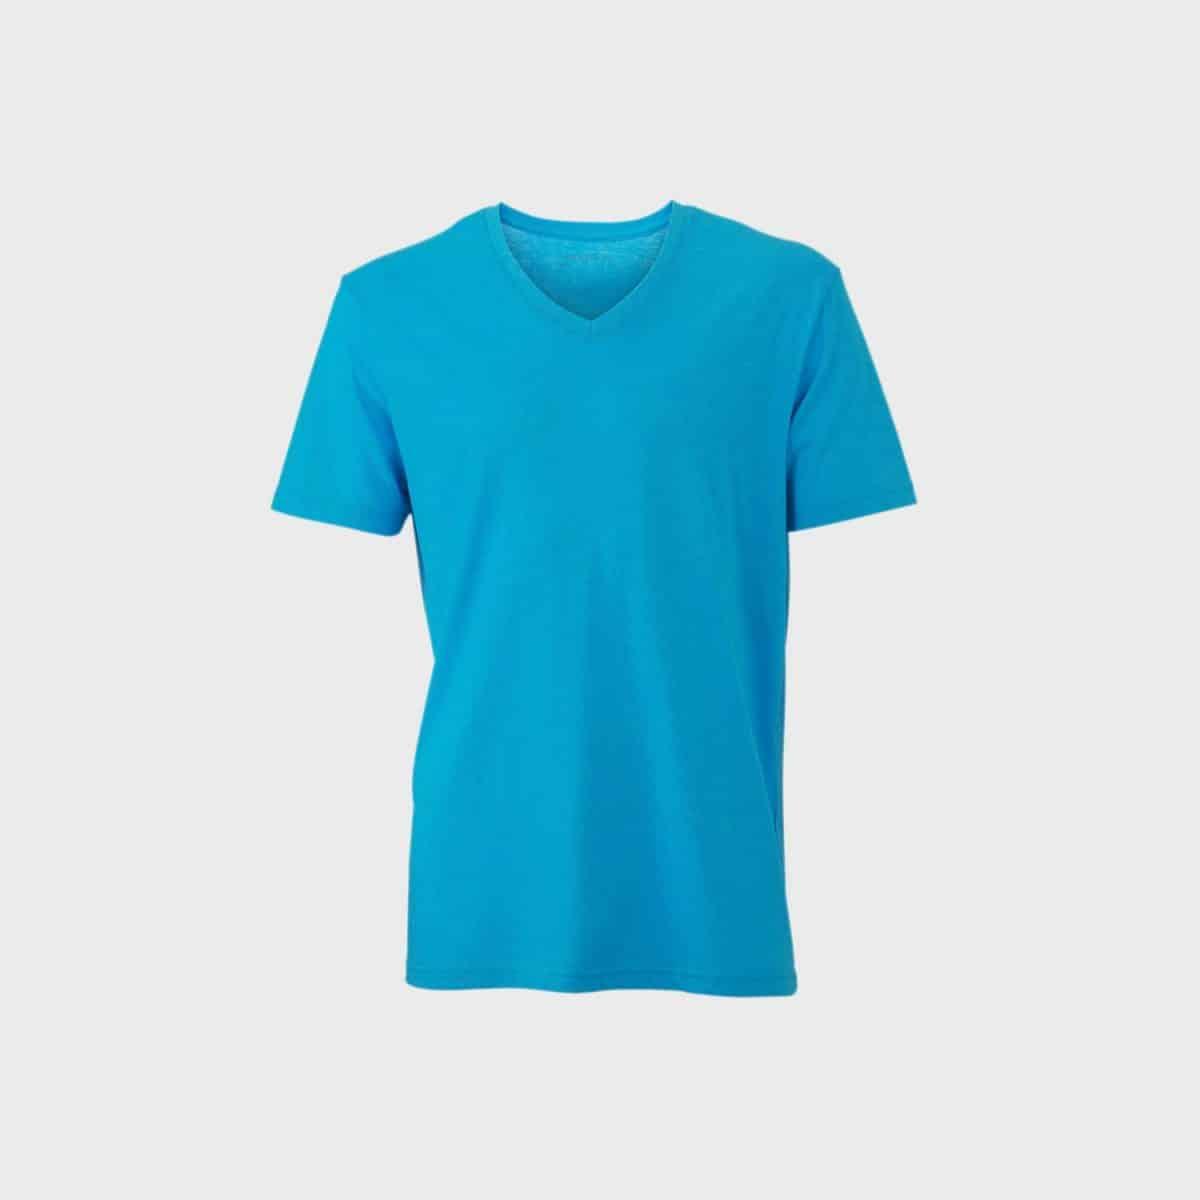 Daiber T Shirts JN974 Turquoisemelange Front